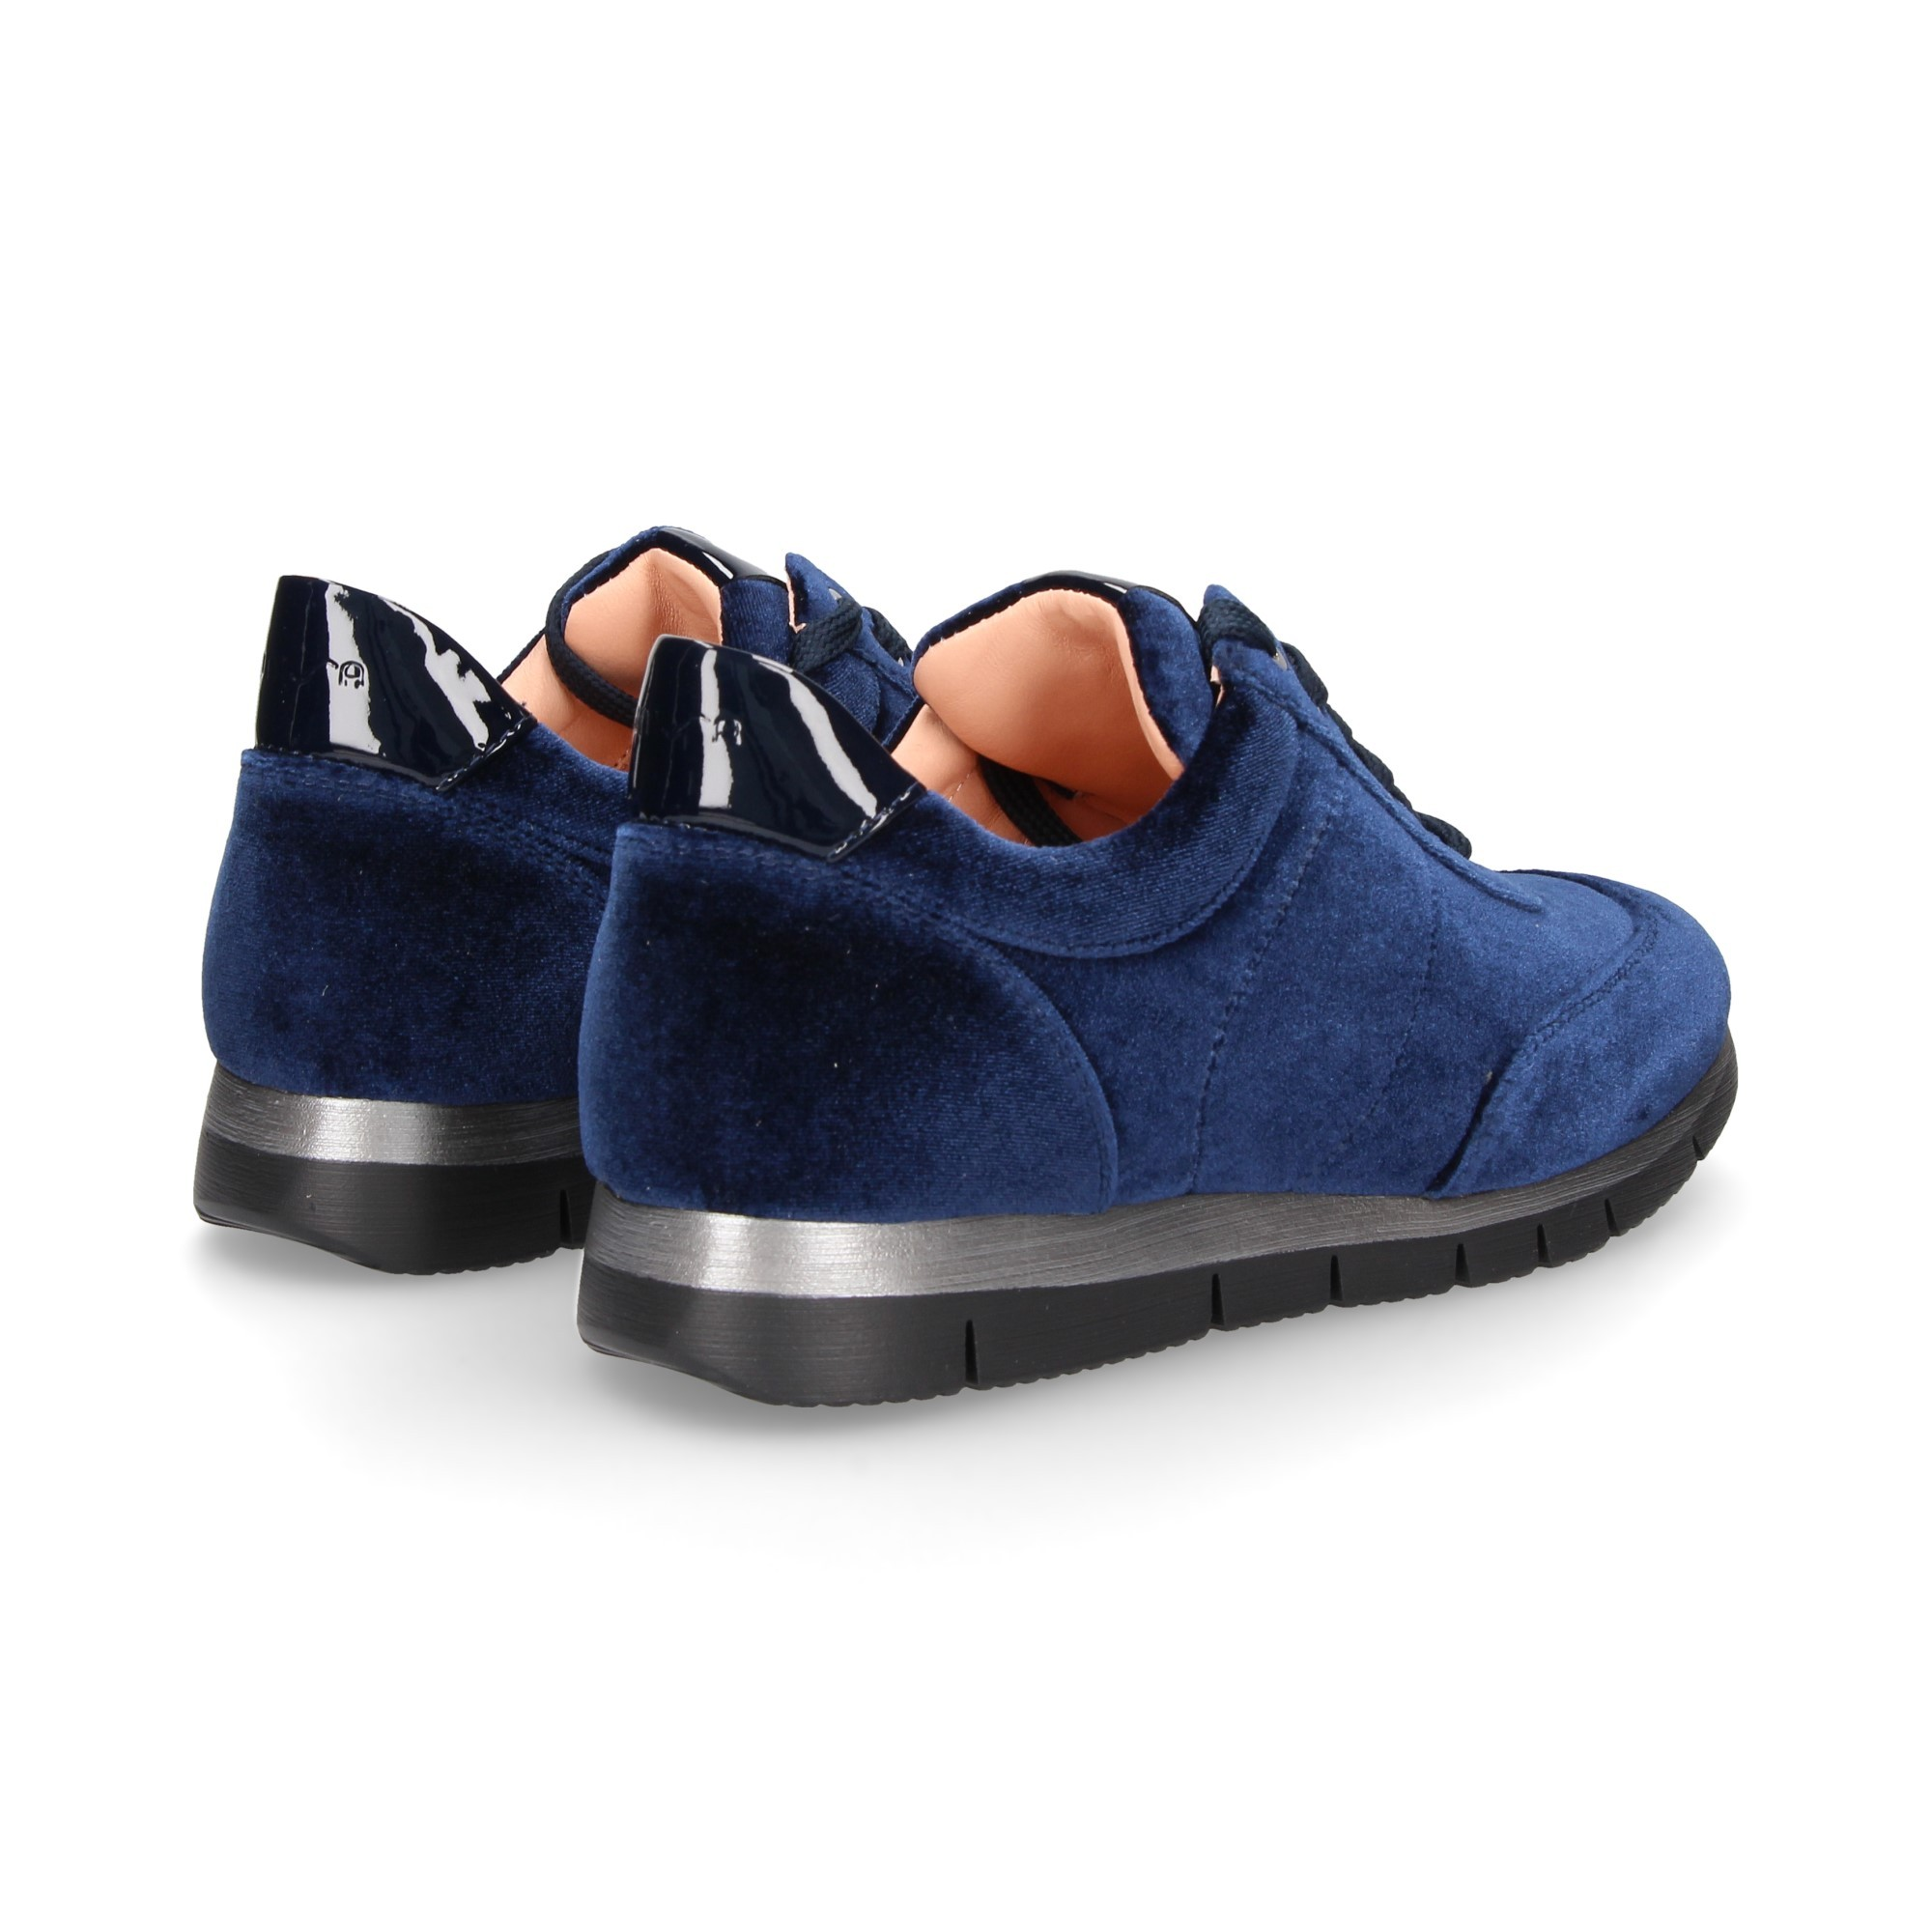 SKECHERS Zapatillas de Mujer 12658 AZUL NVBL